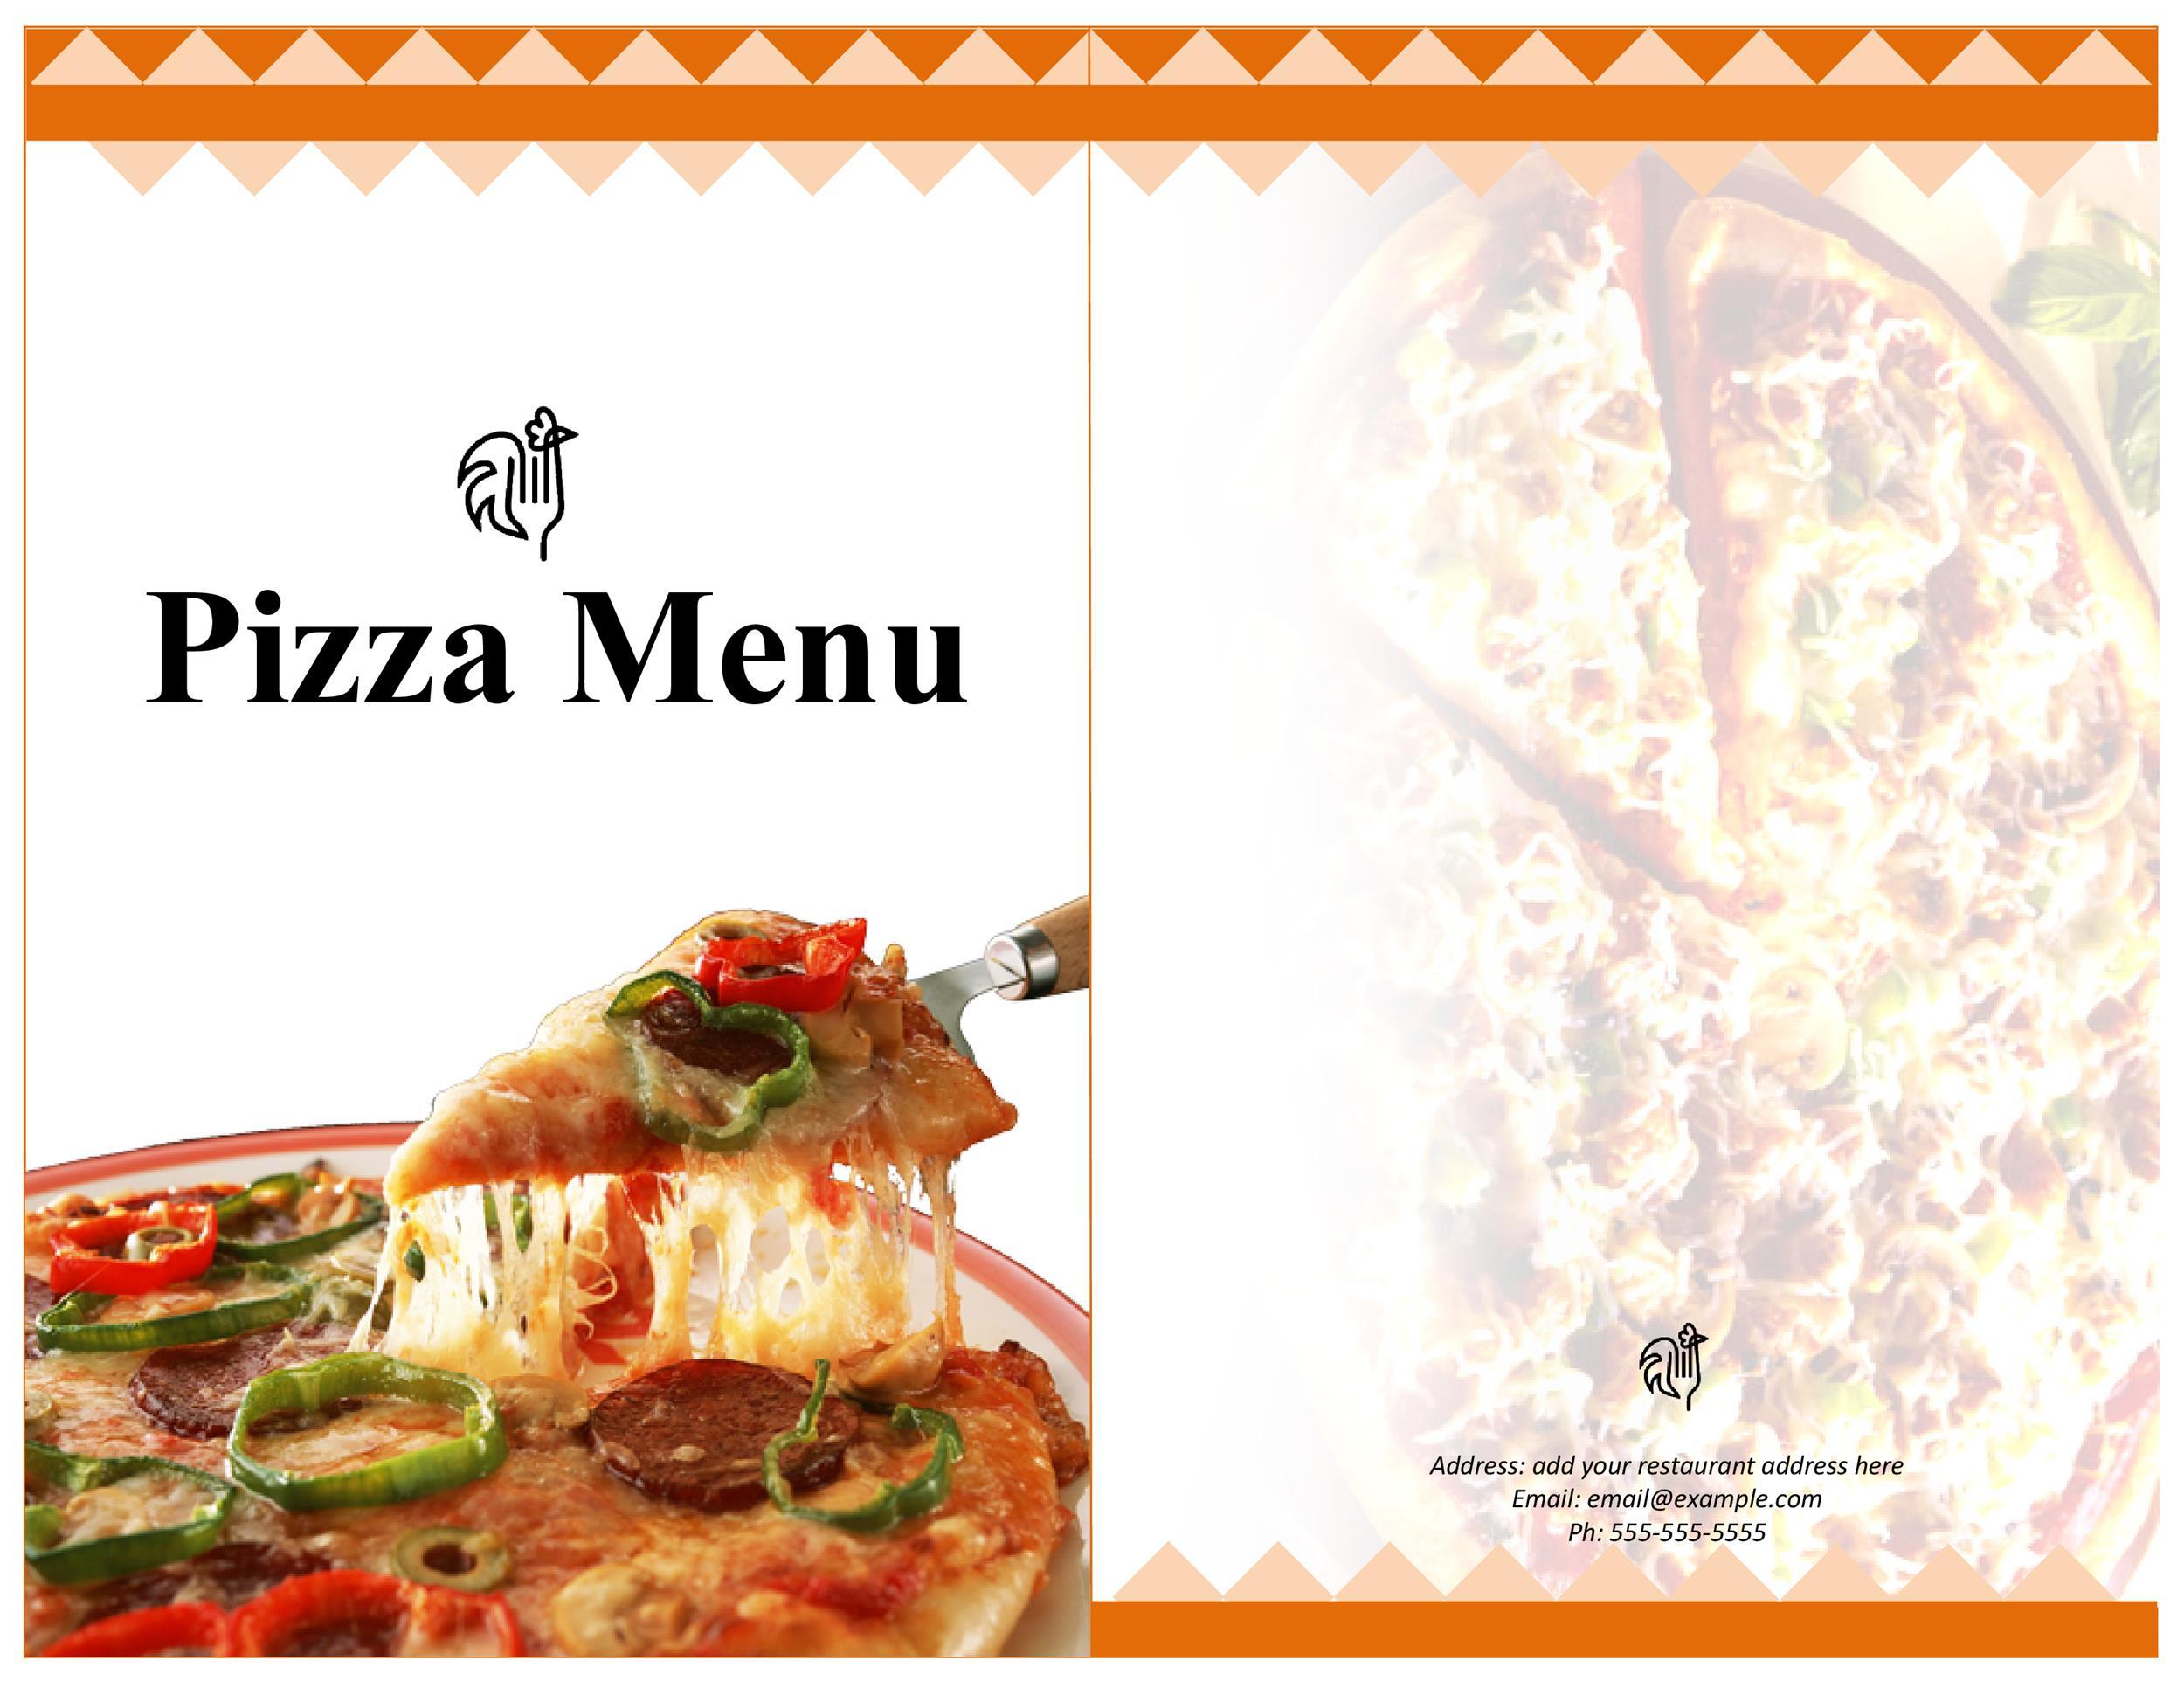 30 Restaurant Menu Templates  Designs - Template Lab - Sample Pizza Menu Template